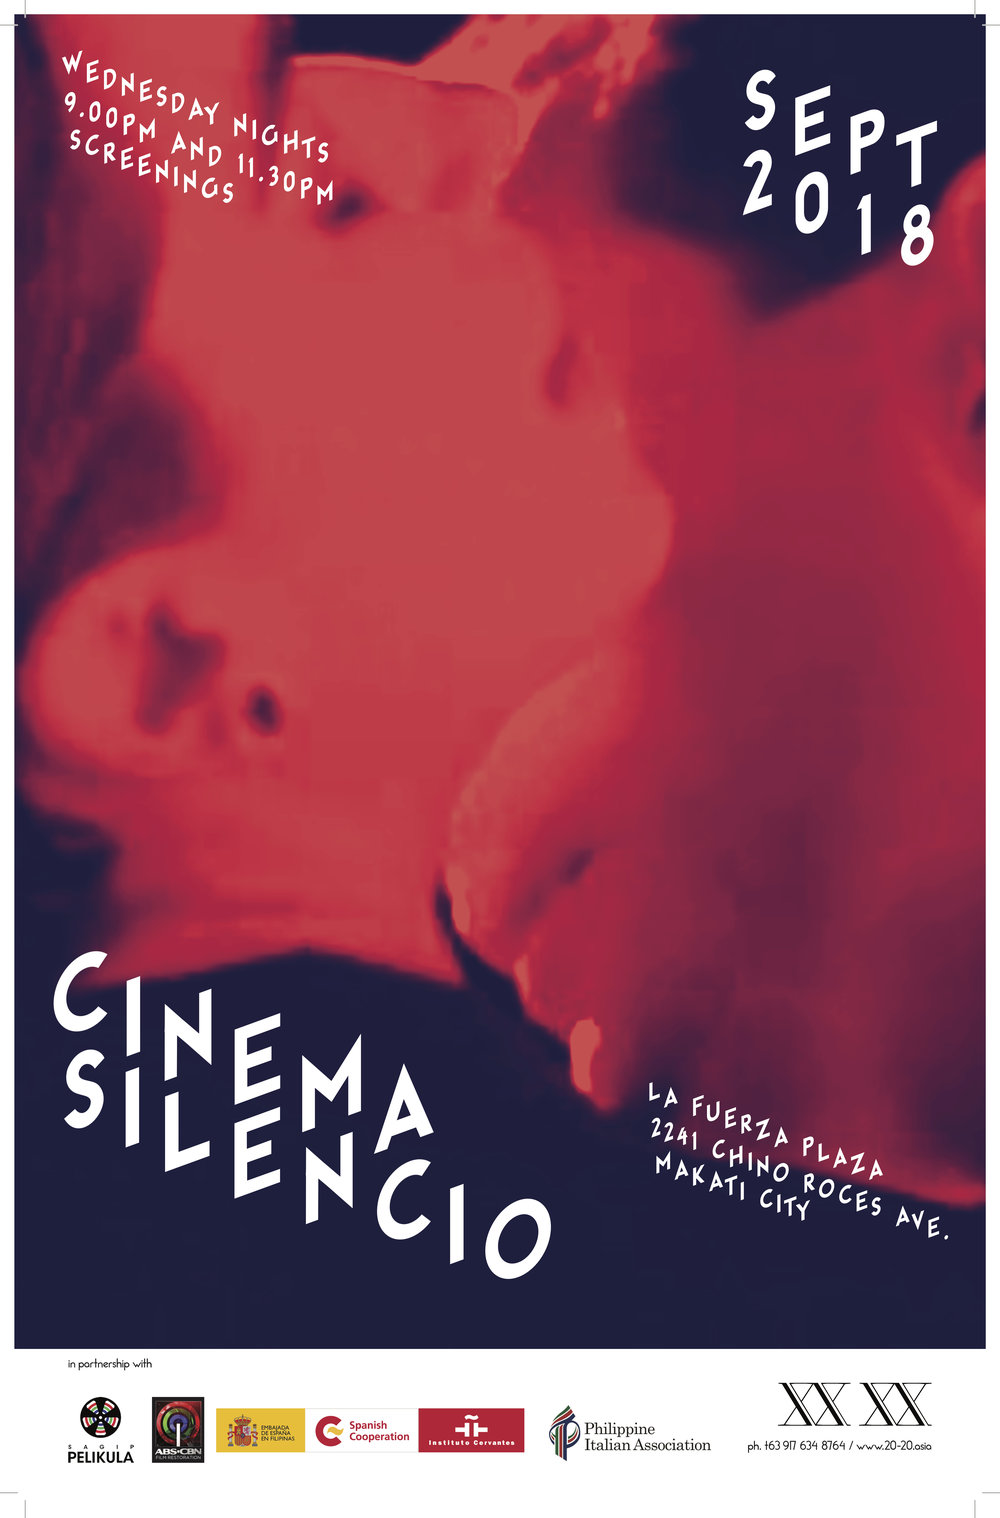 CinemaSilencio_September_Schedule_Cover.jpg